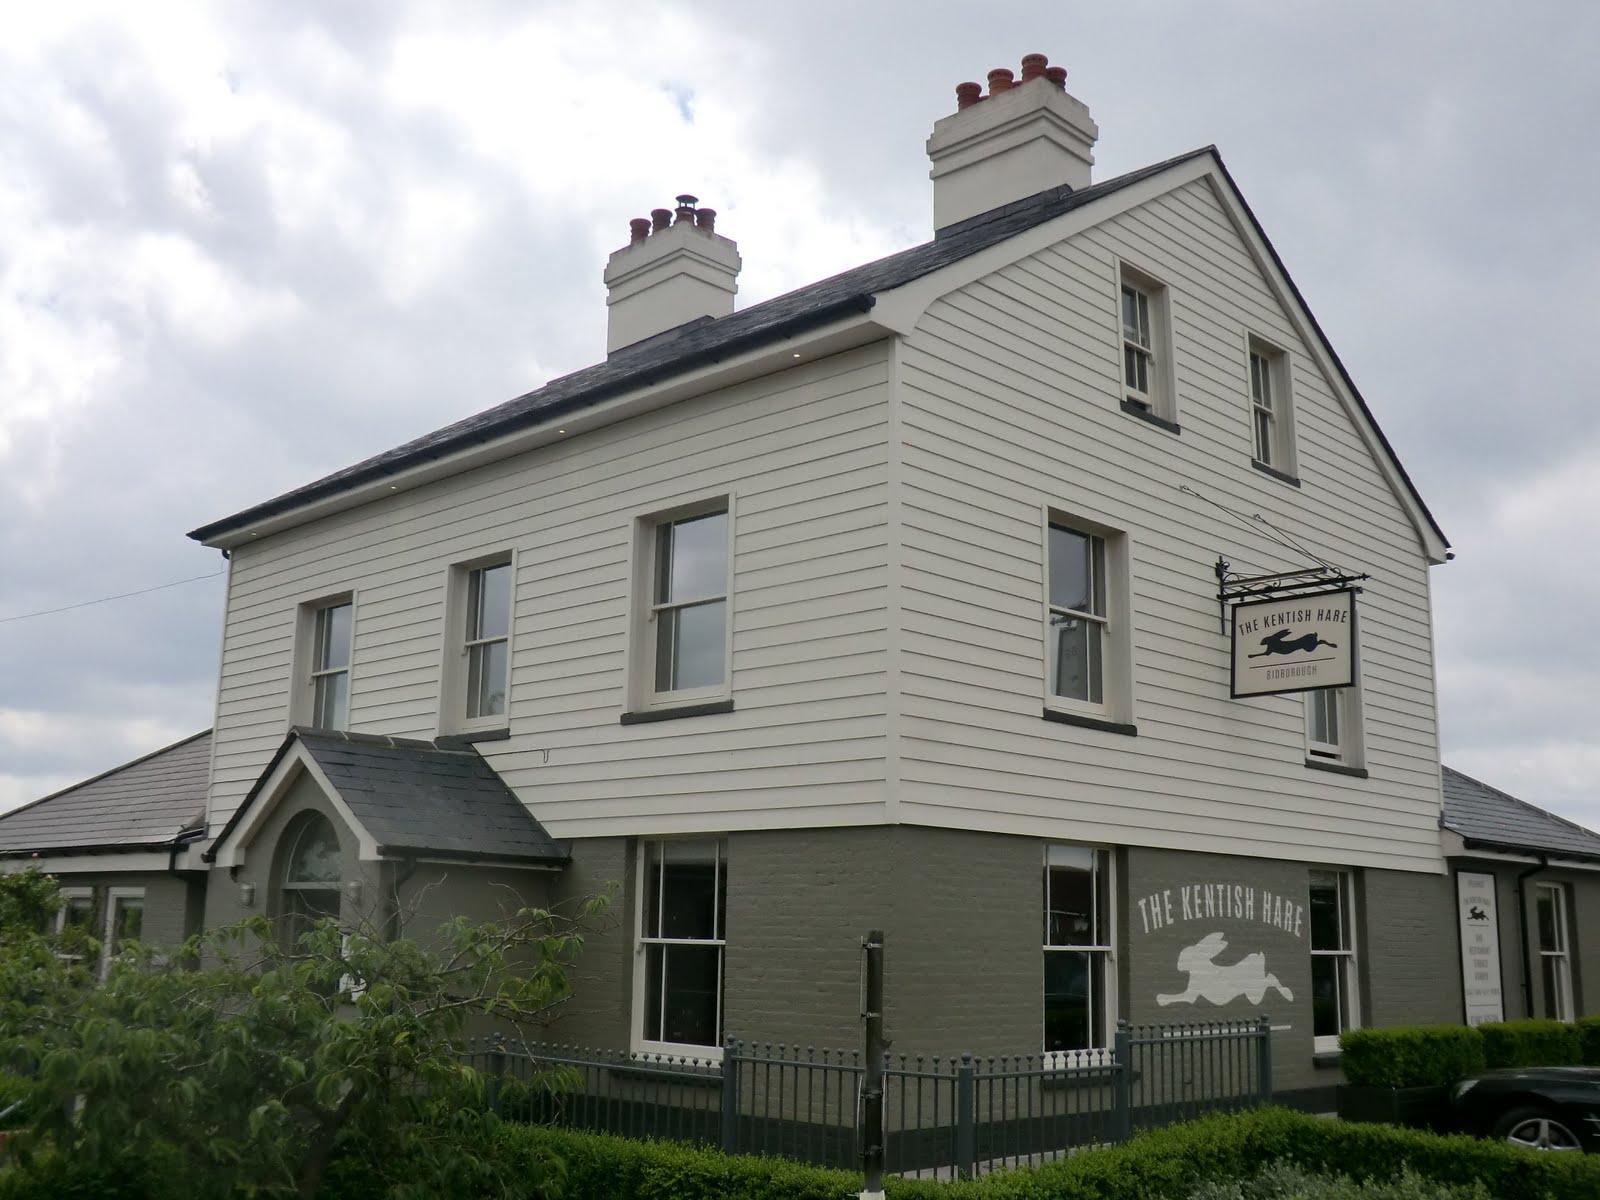 CIMG8591 The Kentish Hare, Bidborough